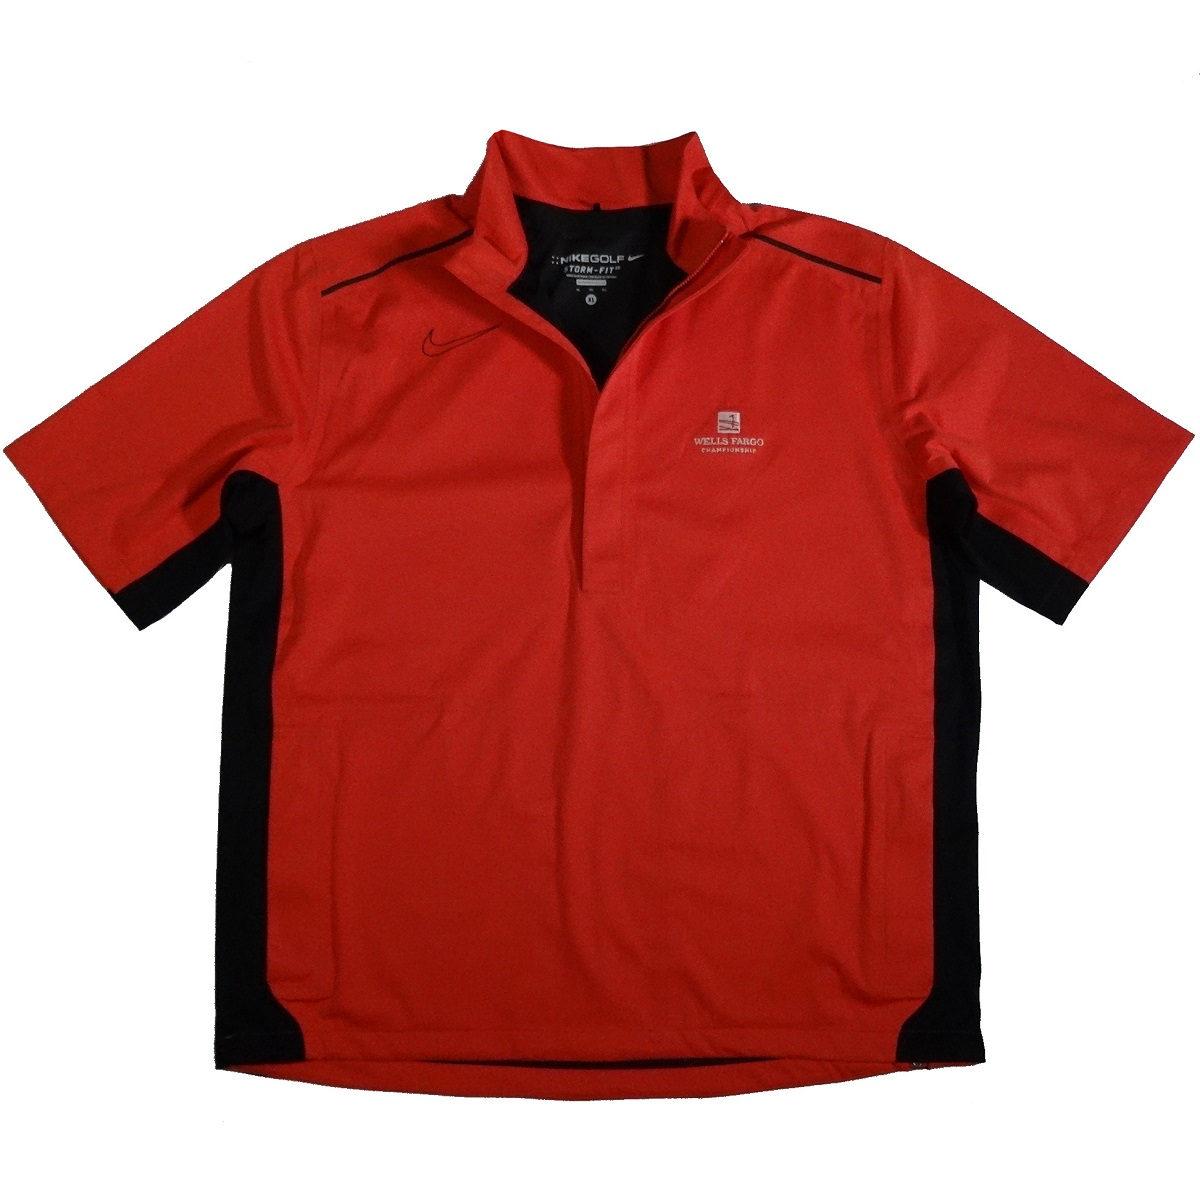 nike golf wells fargo championship storm fit 10 jacket front